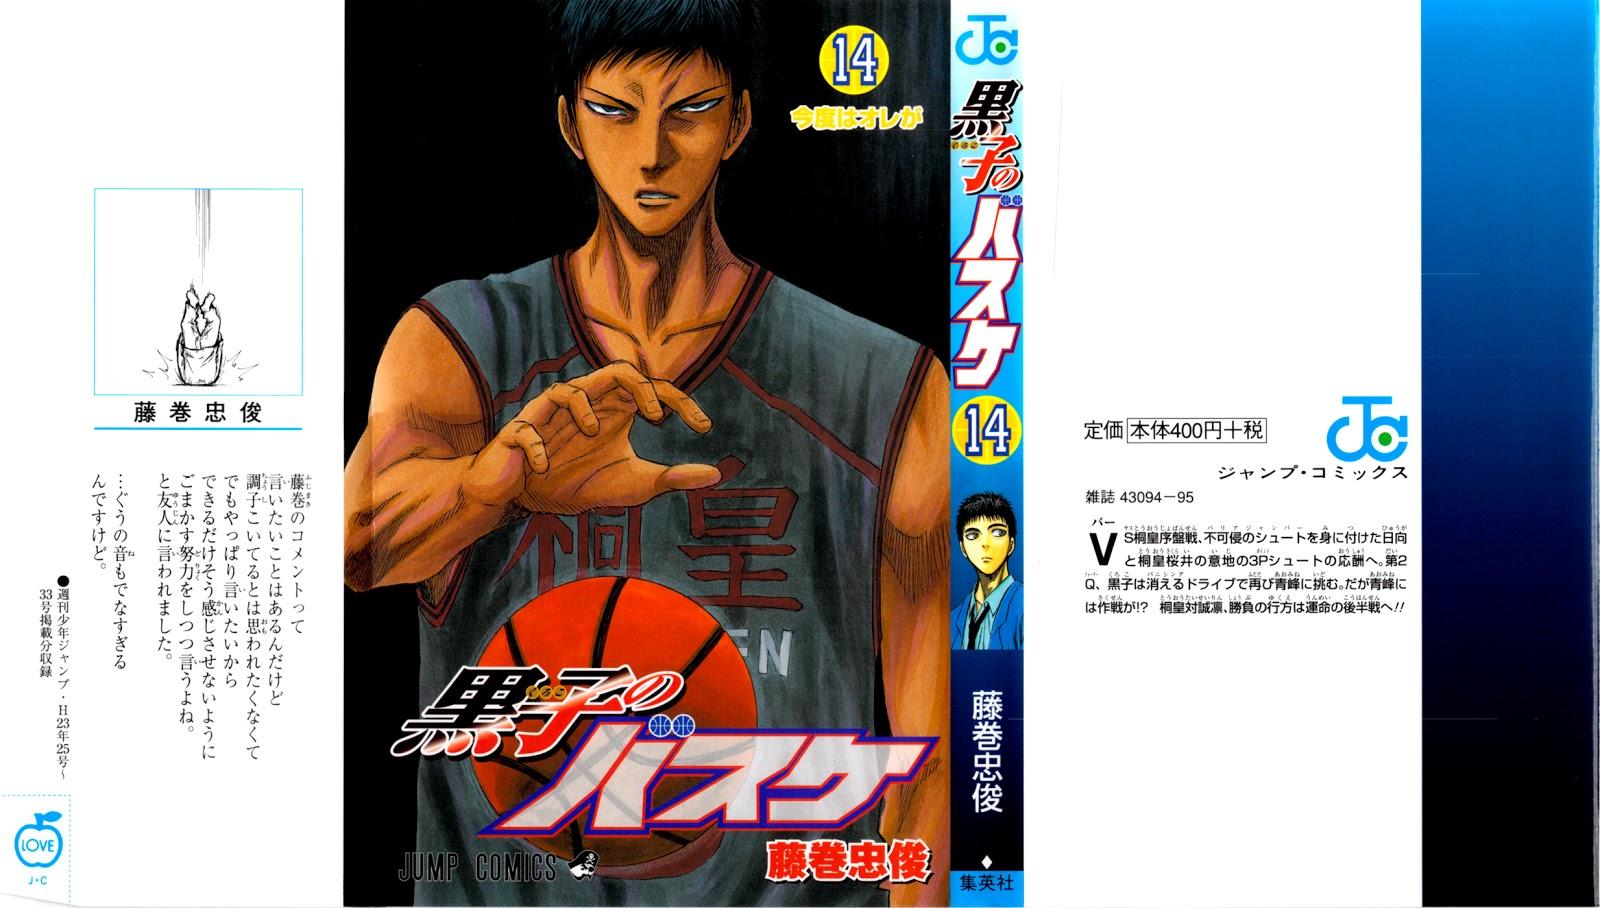 Kuroko no Basket Manga Chapter 118 - Image 1-002